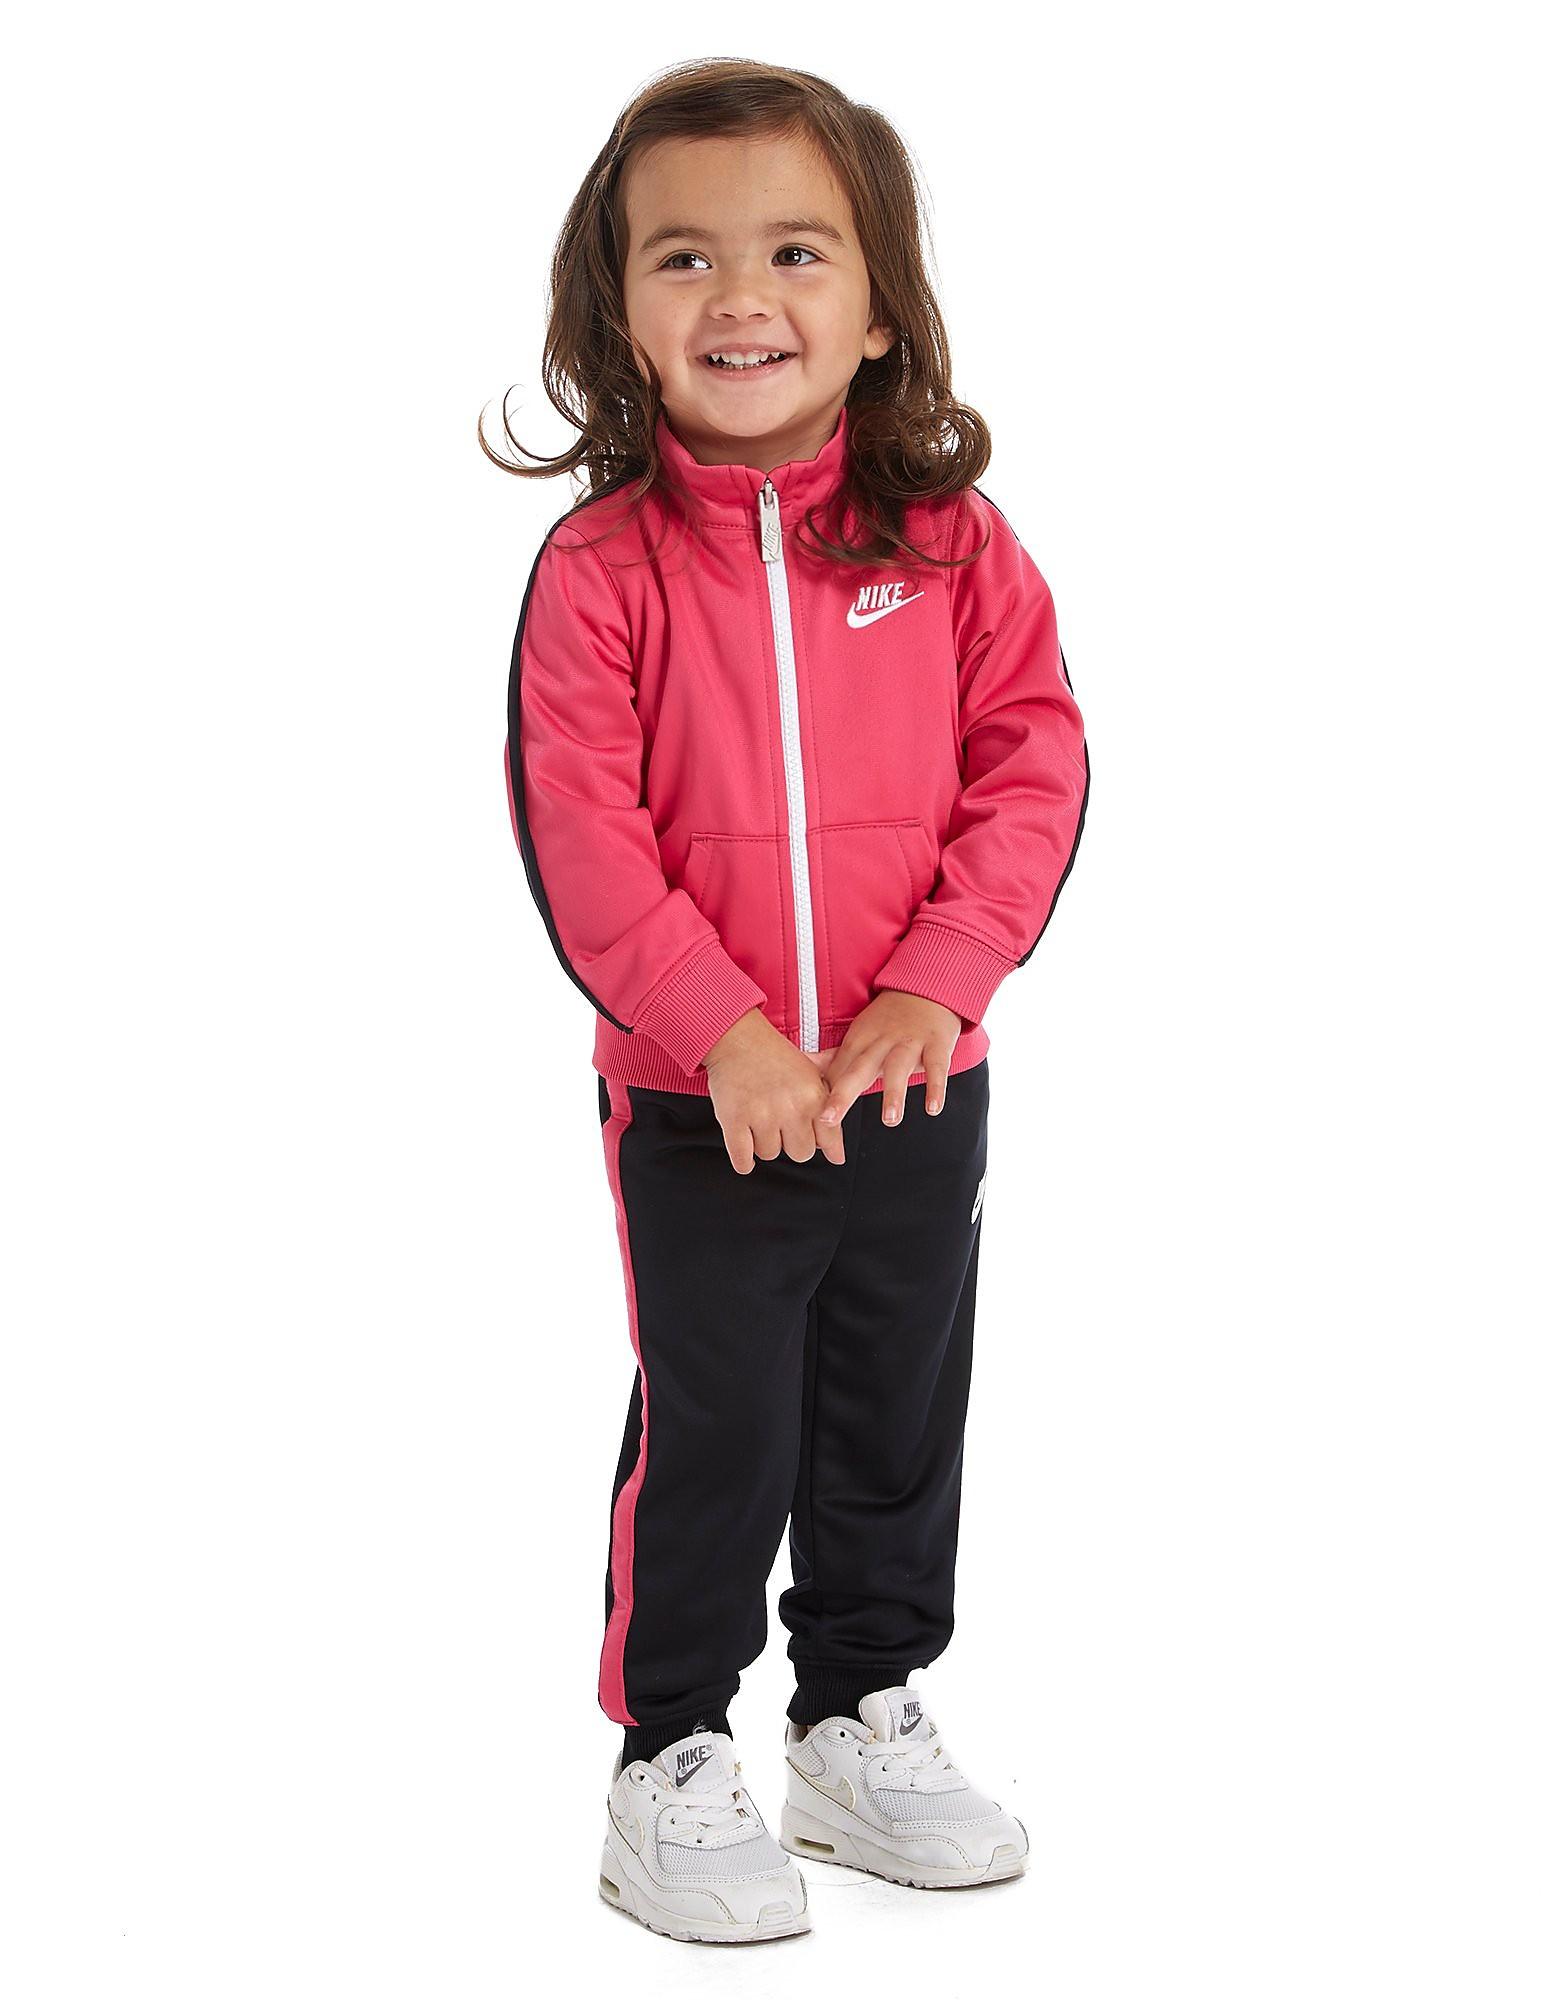 Nike SB Girls Tribute Suit Infant